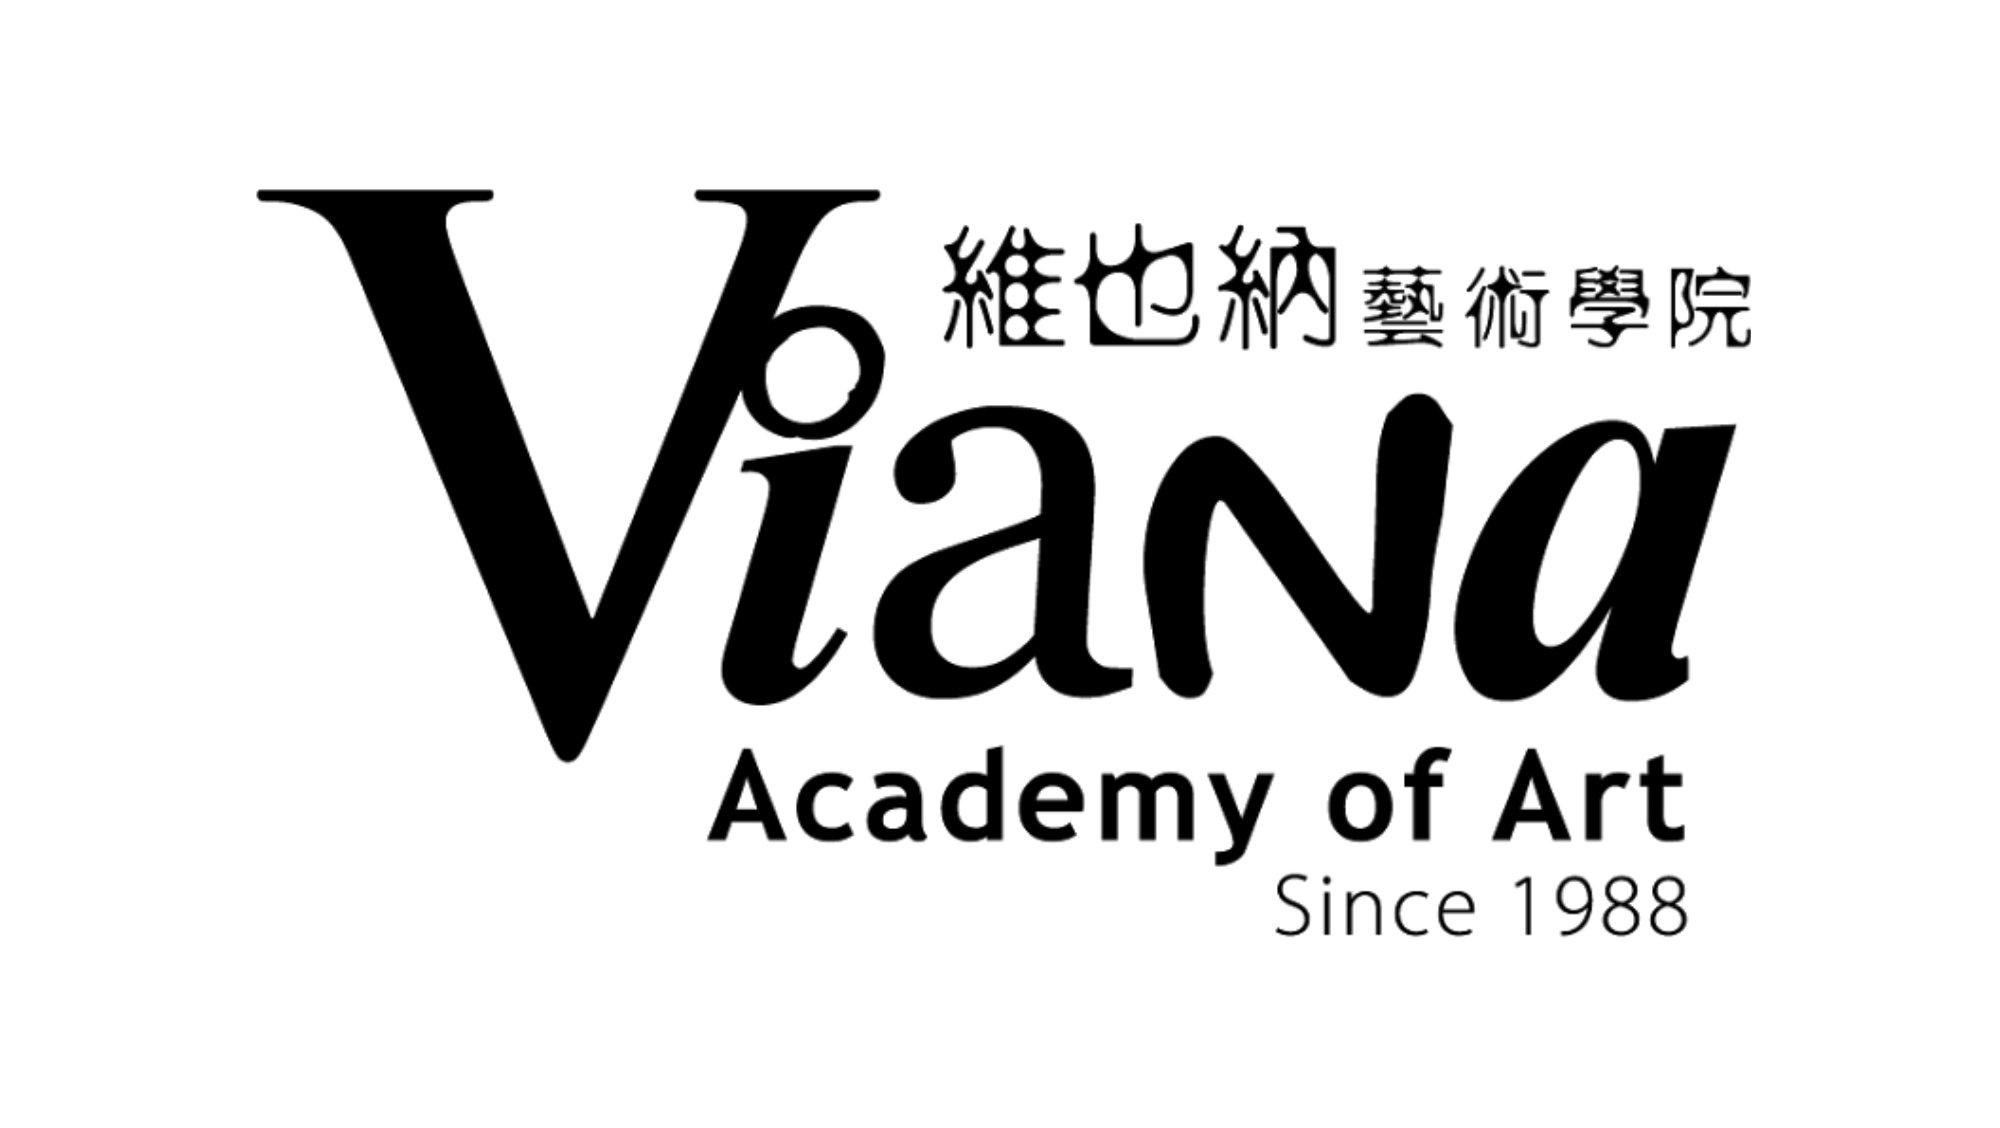 Viana Academy of Art Logo Mark Artist Joey Kher Batik Art Batu Pahat Johor Malaysia A01